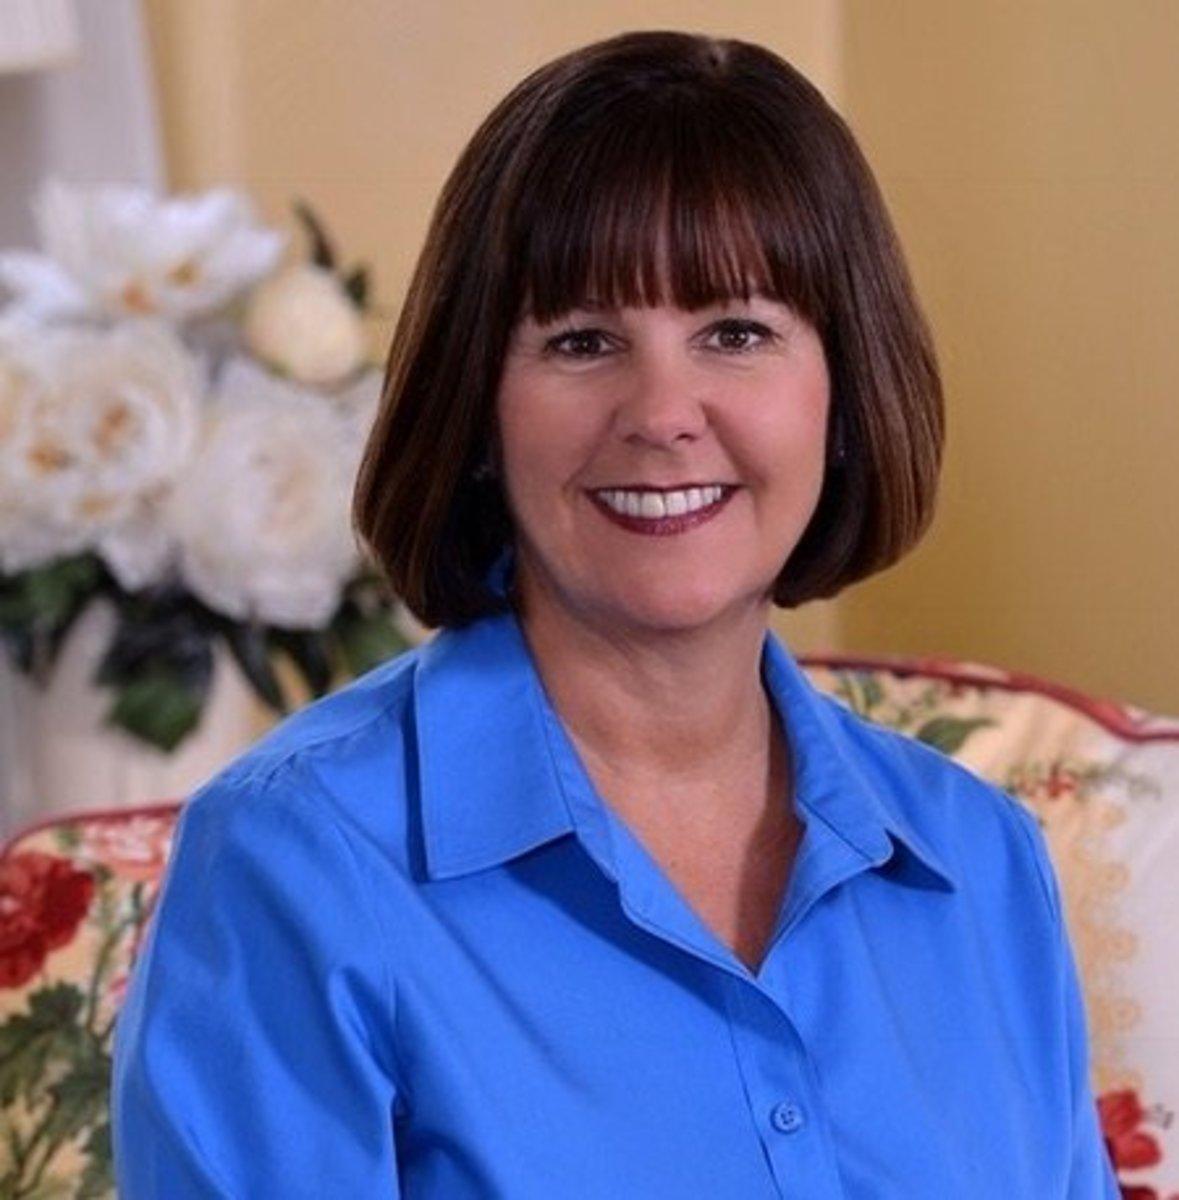 Karen Pence: Wife of Vice President